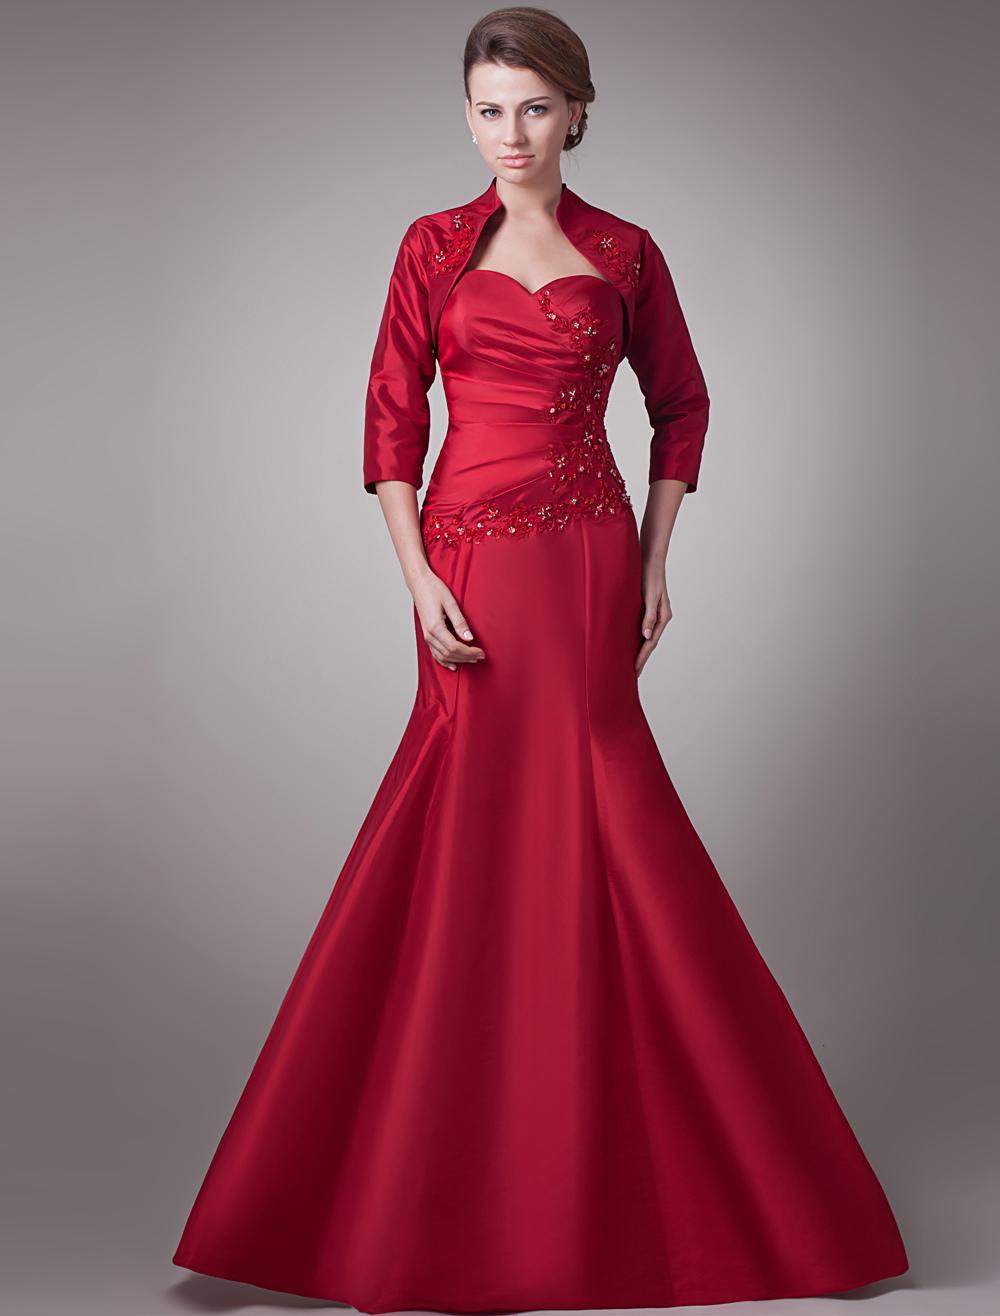 Sequin Taffeta Mother of the Bride Dress